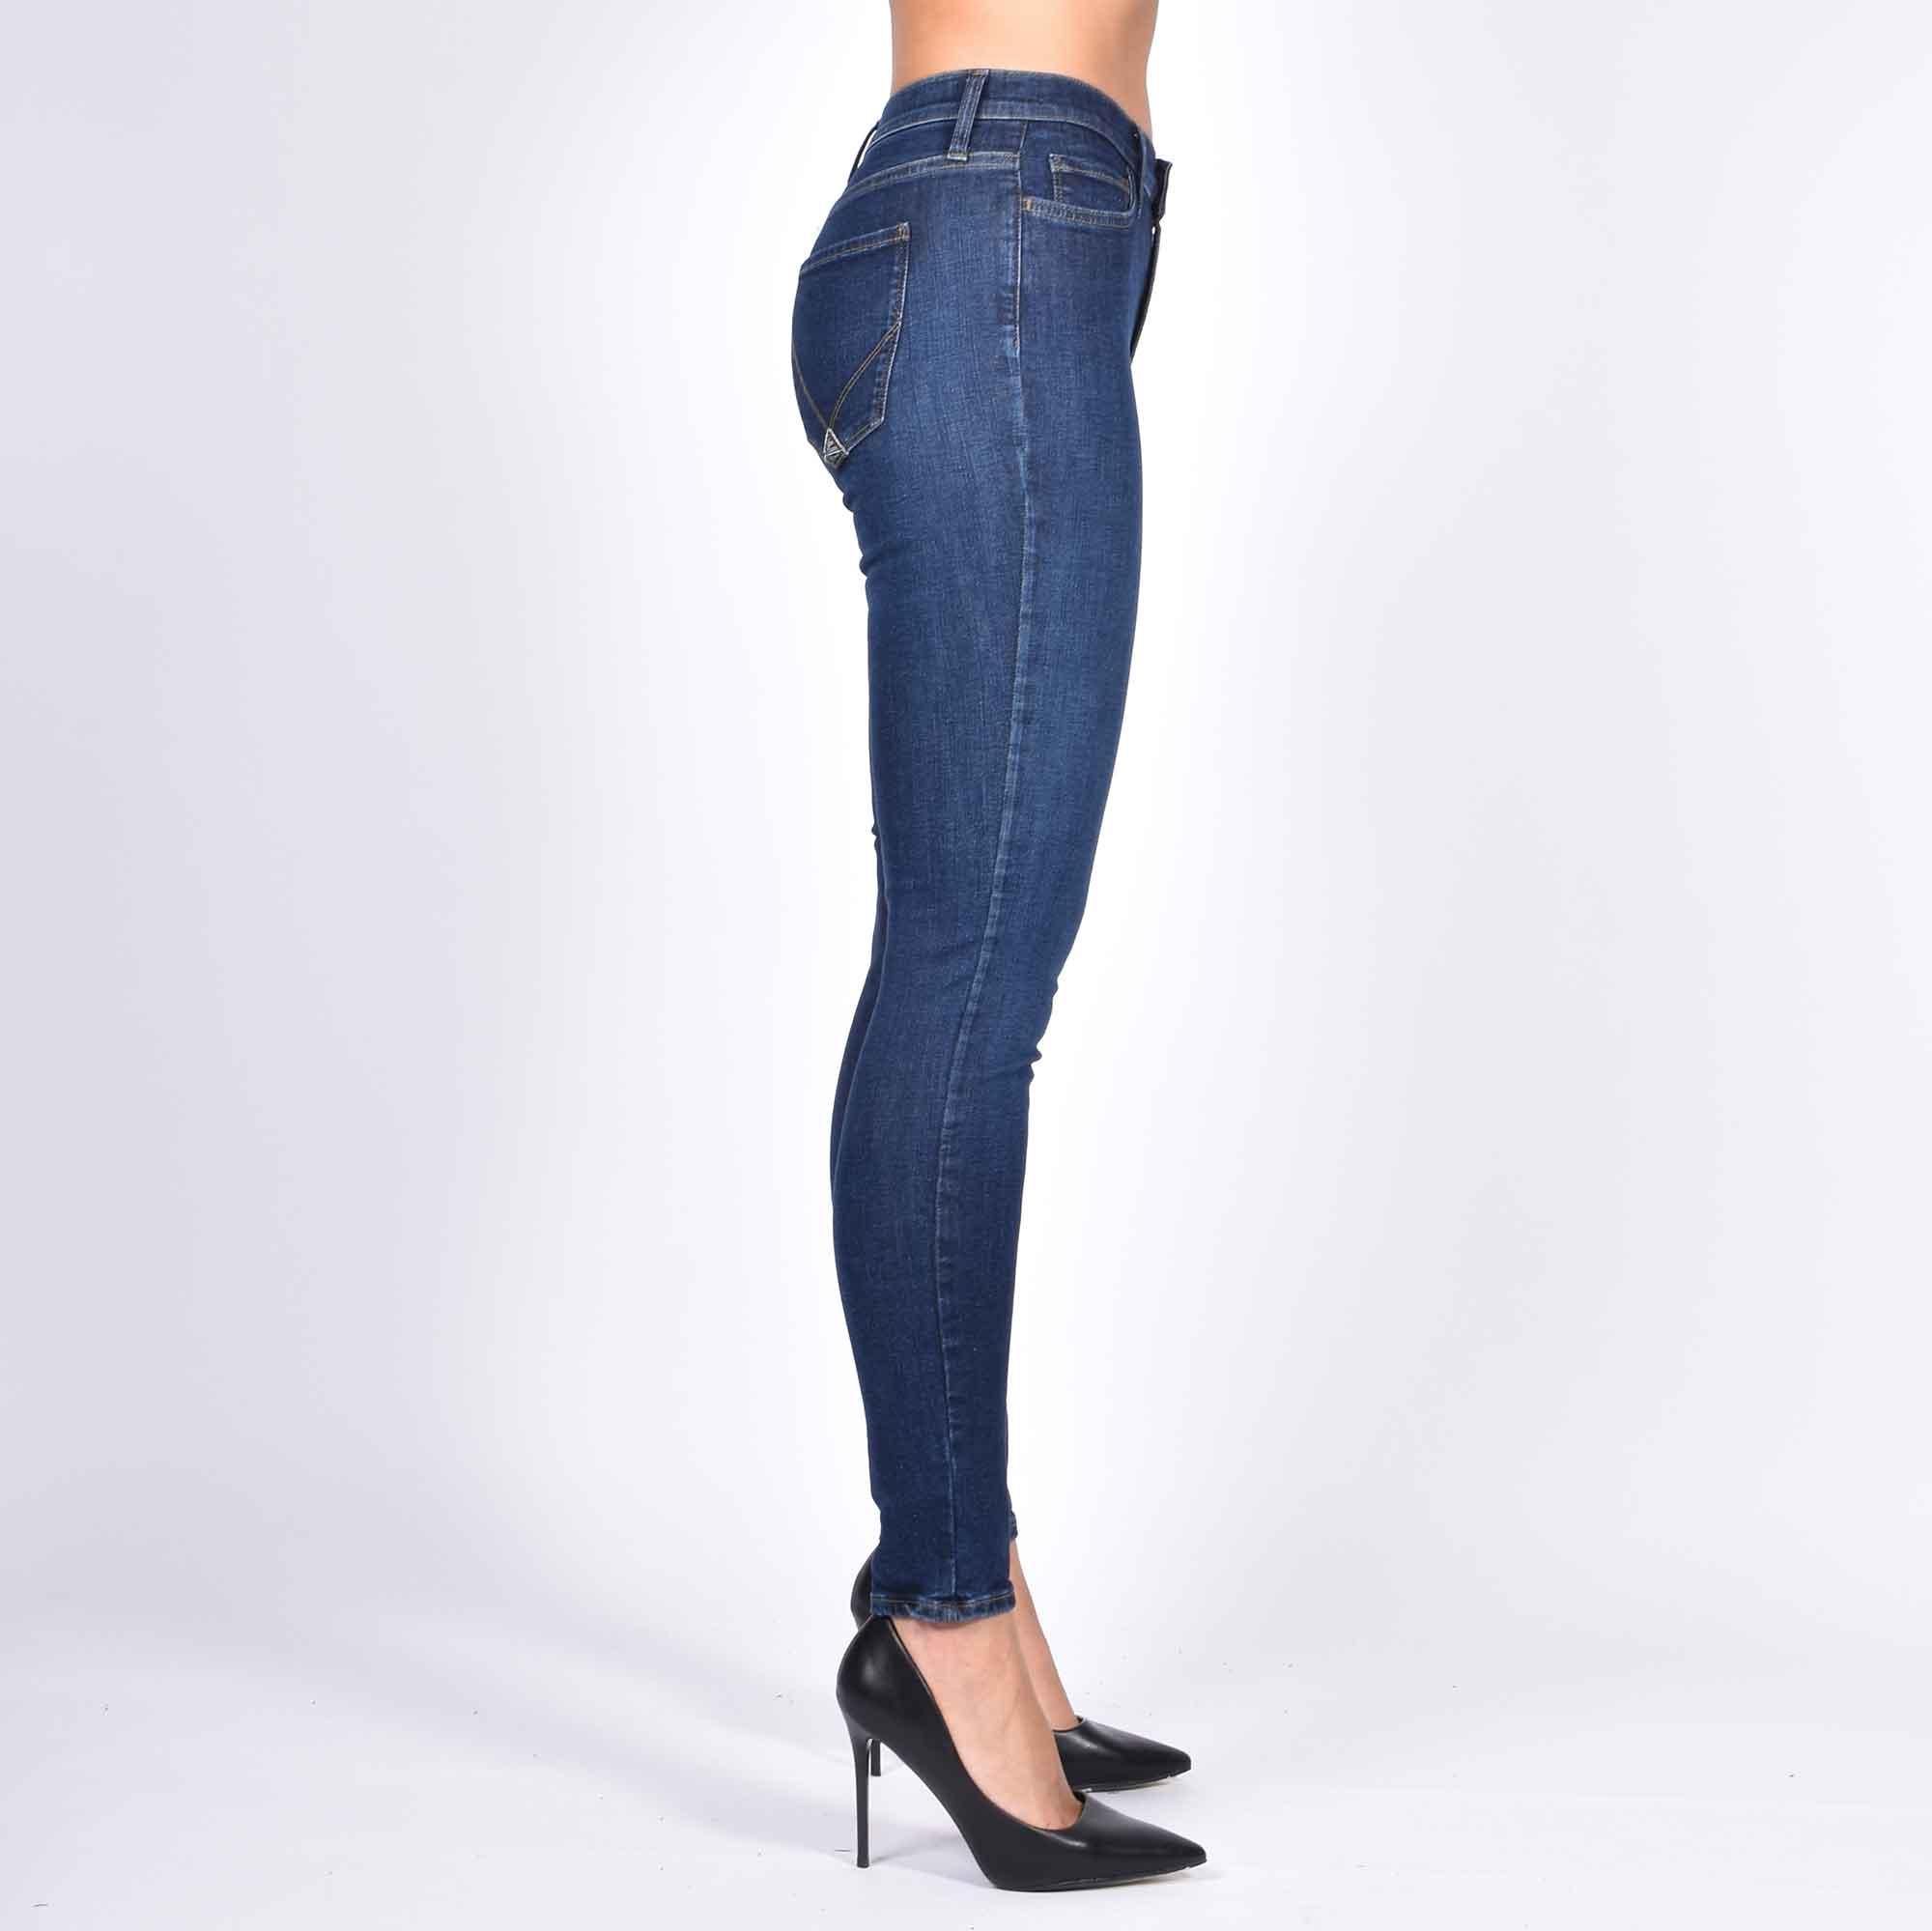 Jeans high cate ottawa - Denim